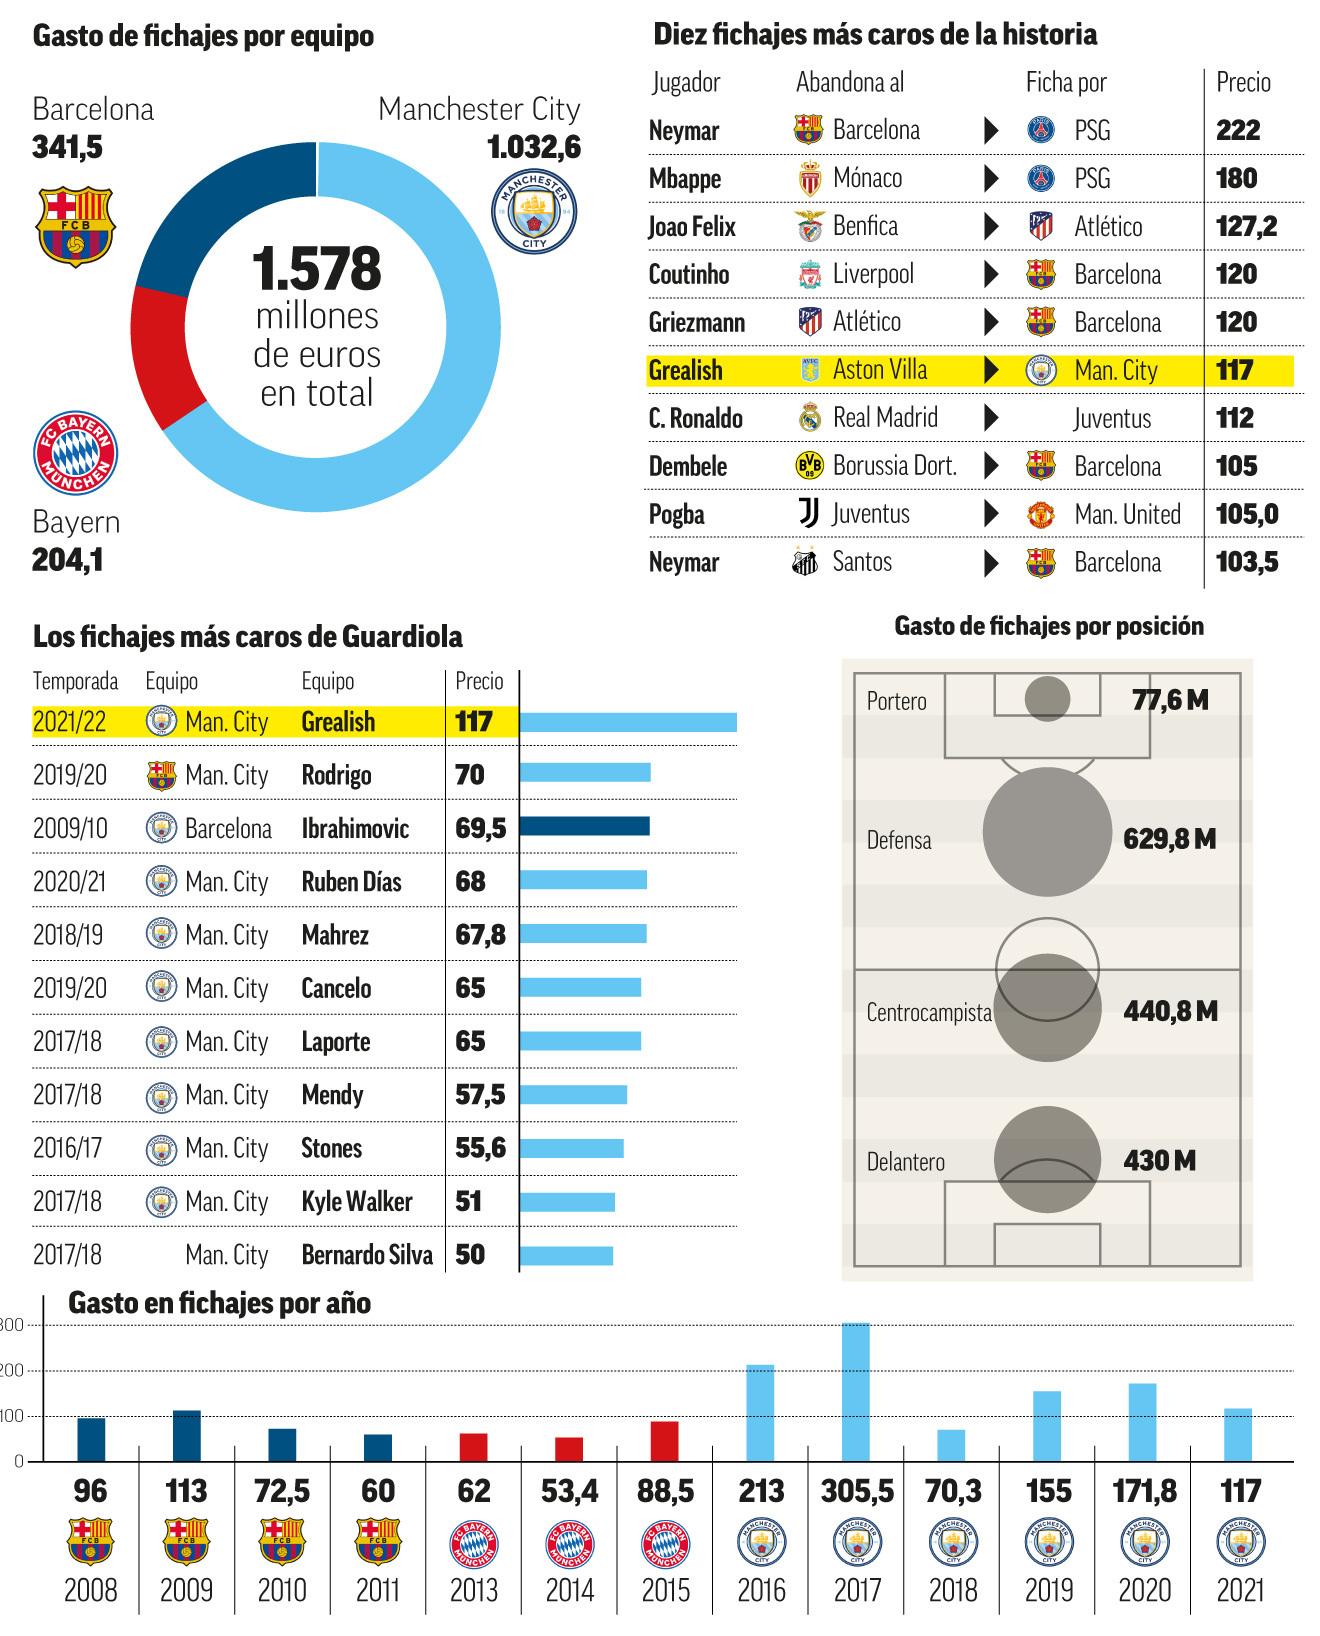 Guardiola breaks the barrier of 1000 million in signings in